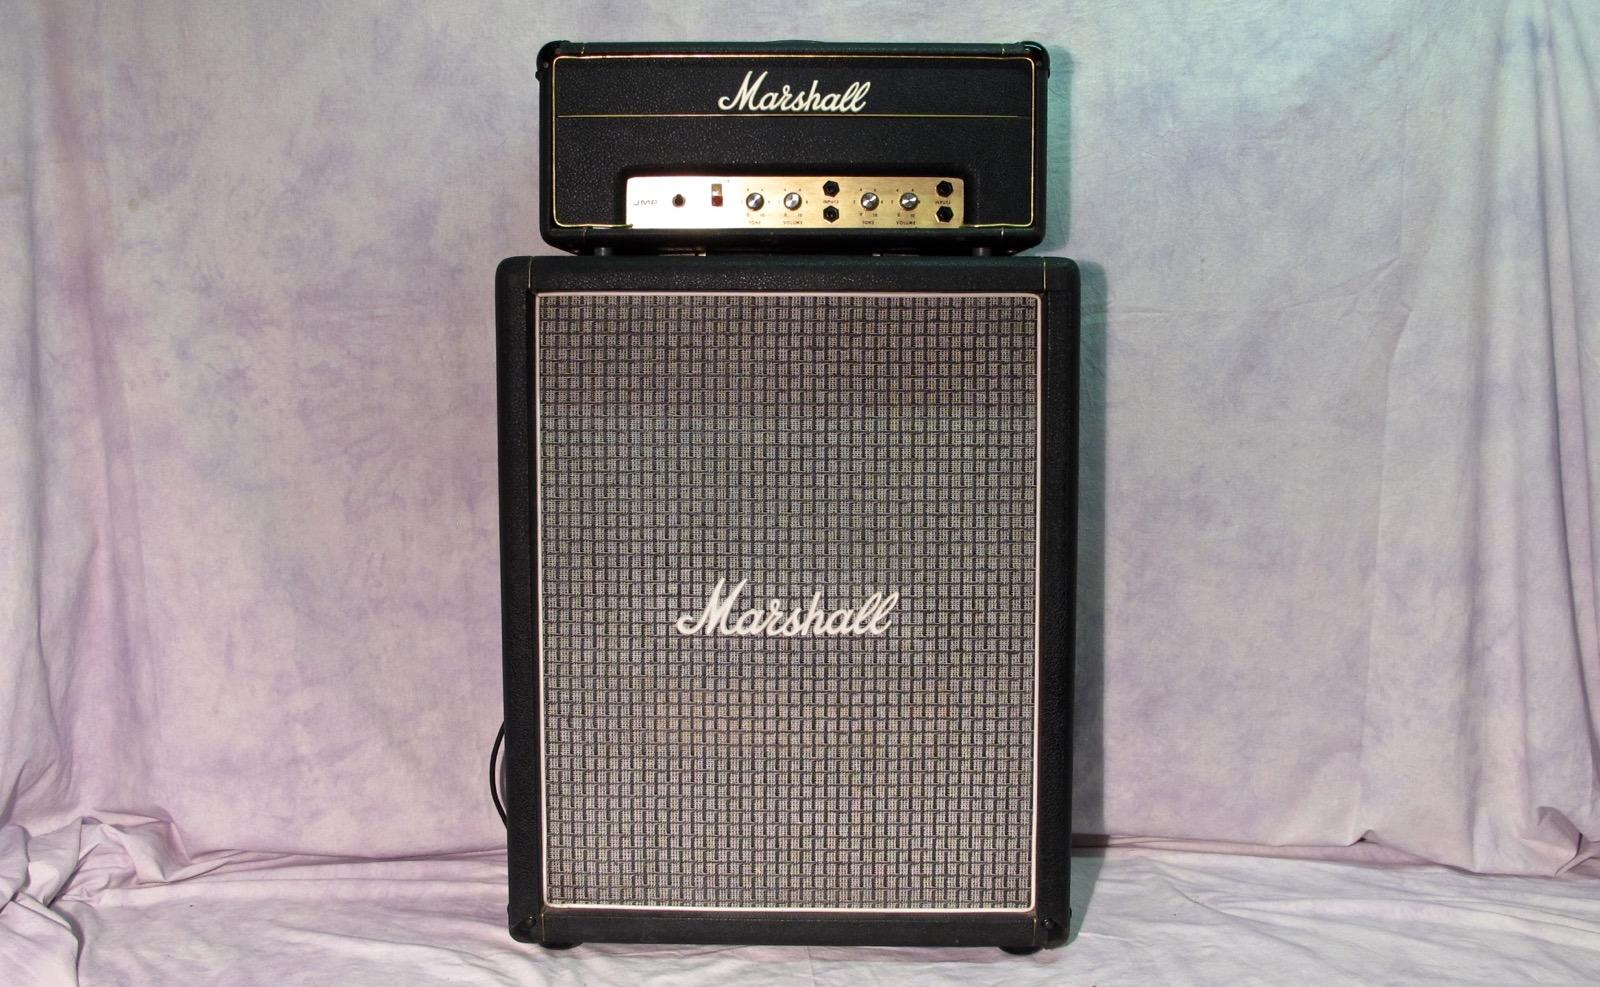 marshall 2061 lead bass 1972 black tolex amp for sale andy baxter bass guitars ltd. Black Bedroom Furniture Sets. Home Design Ideas